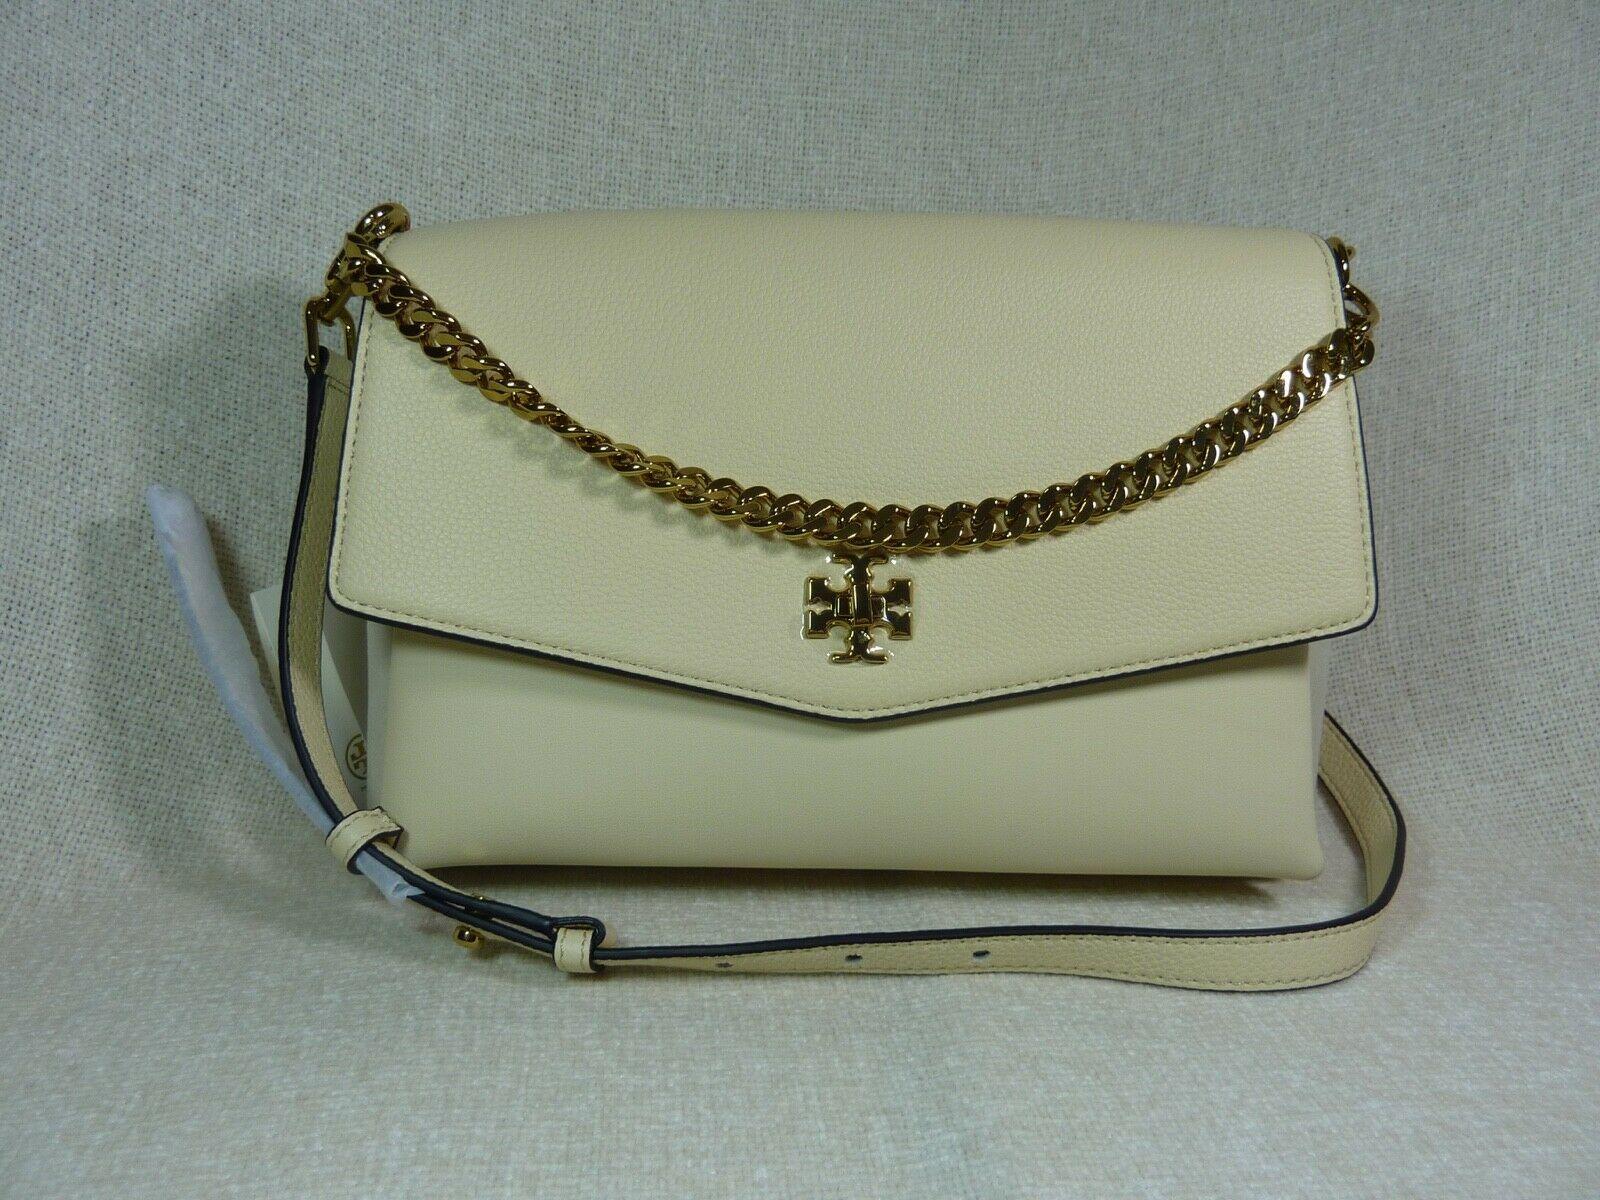 NWT Tory Burch New Cream KIRA Mixed-material Double-strap Shoulder Bag